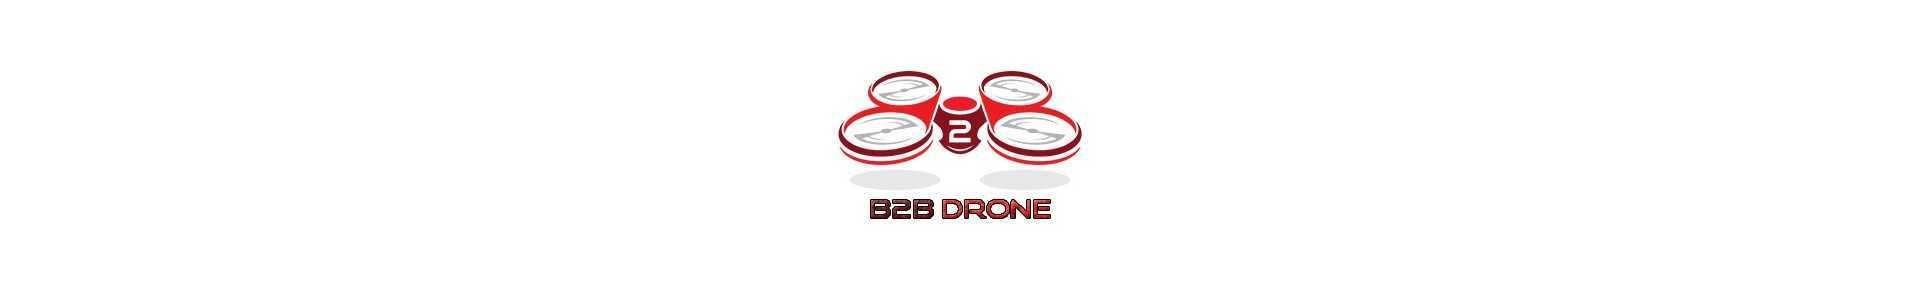 B2B Drone LIPO Battery